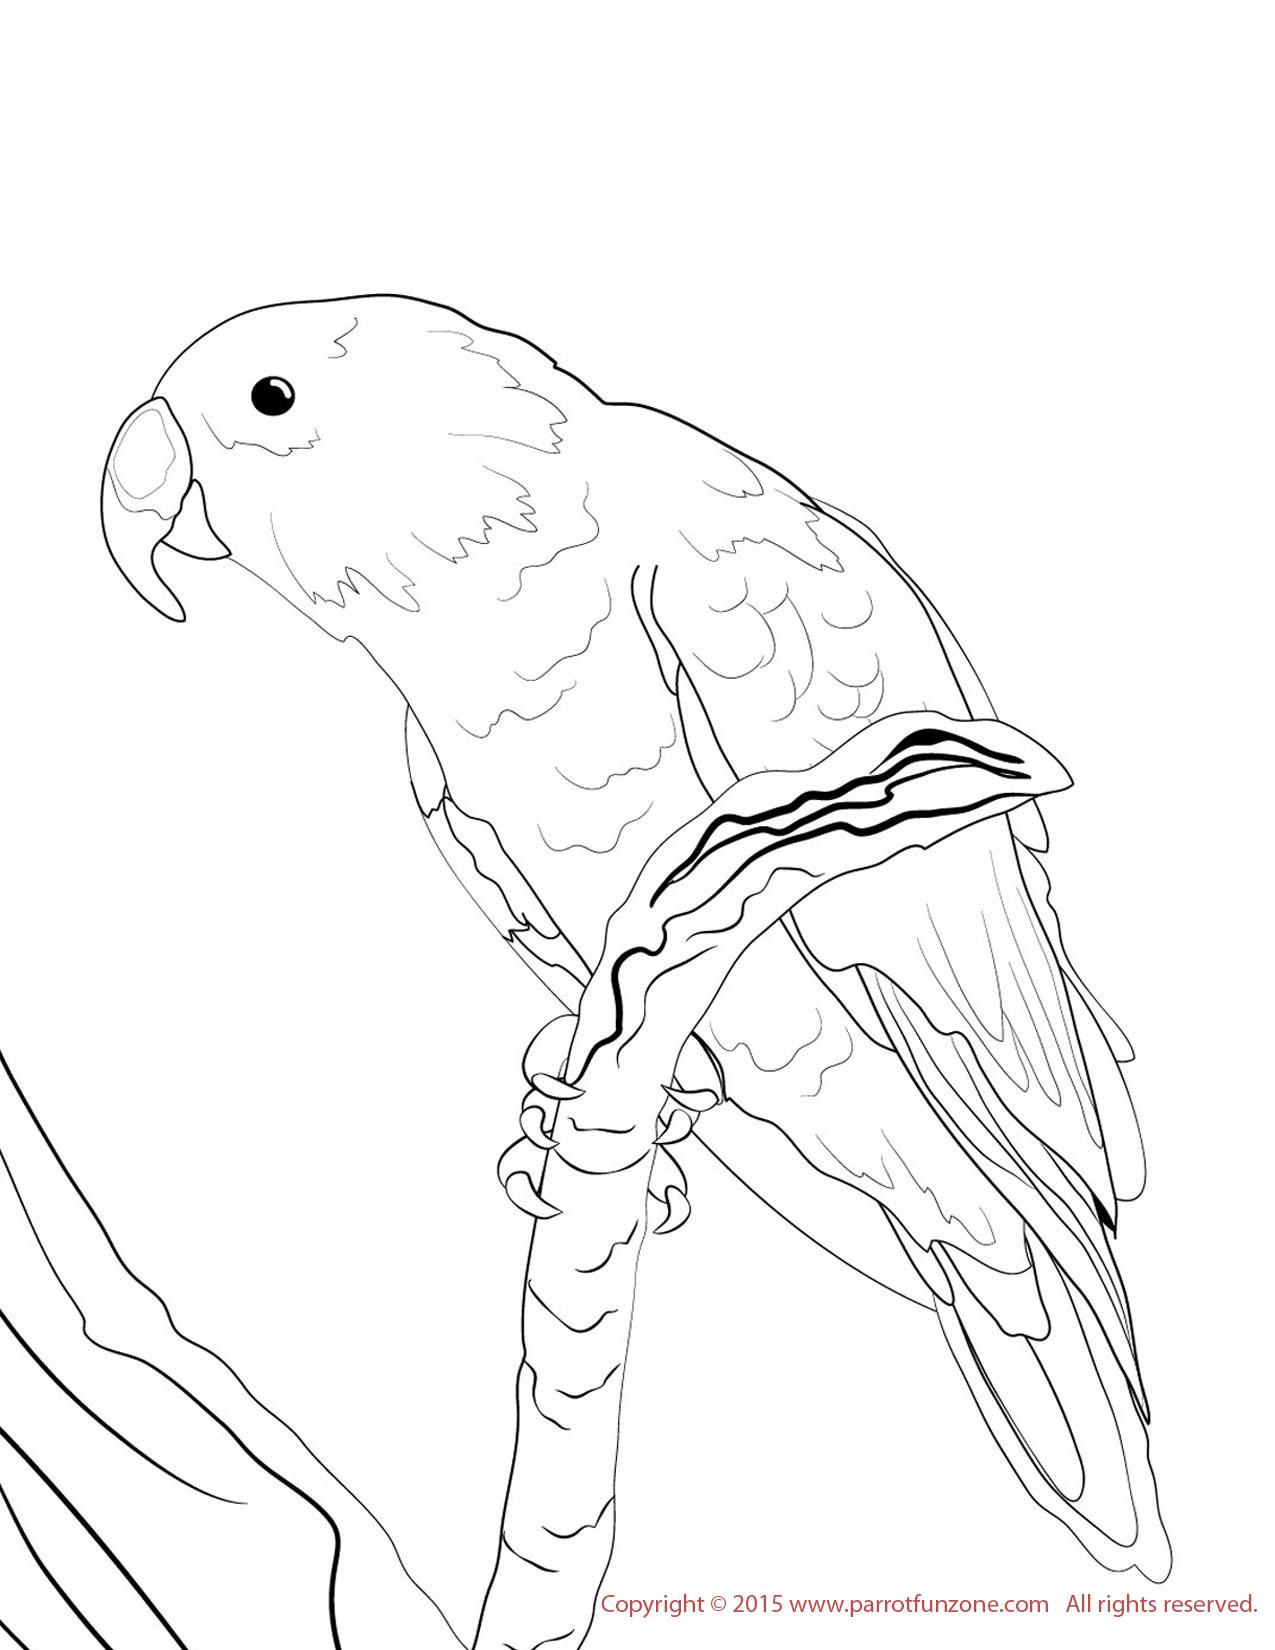 Conure coloring #12, Download drawings